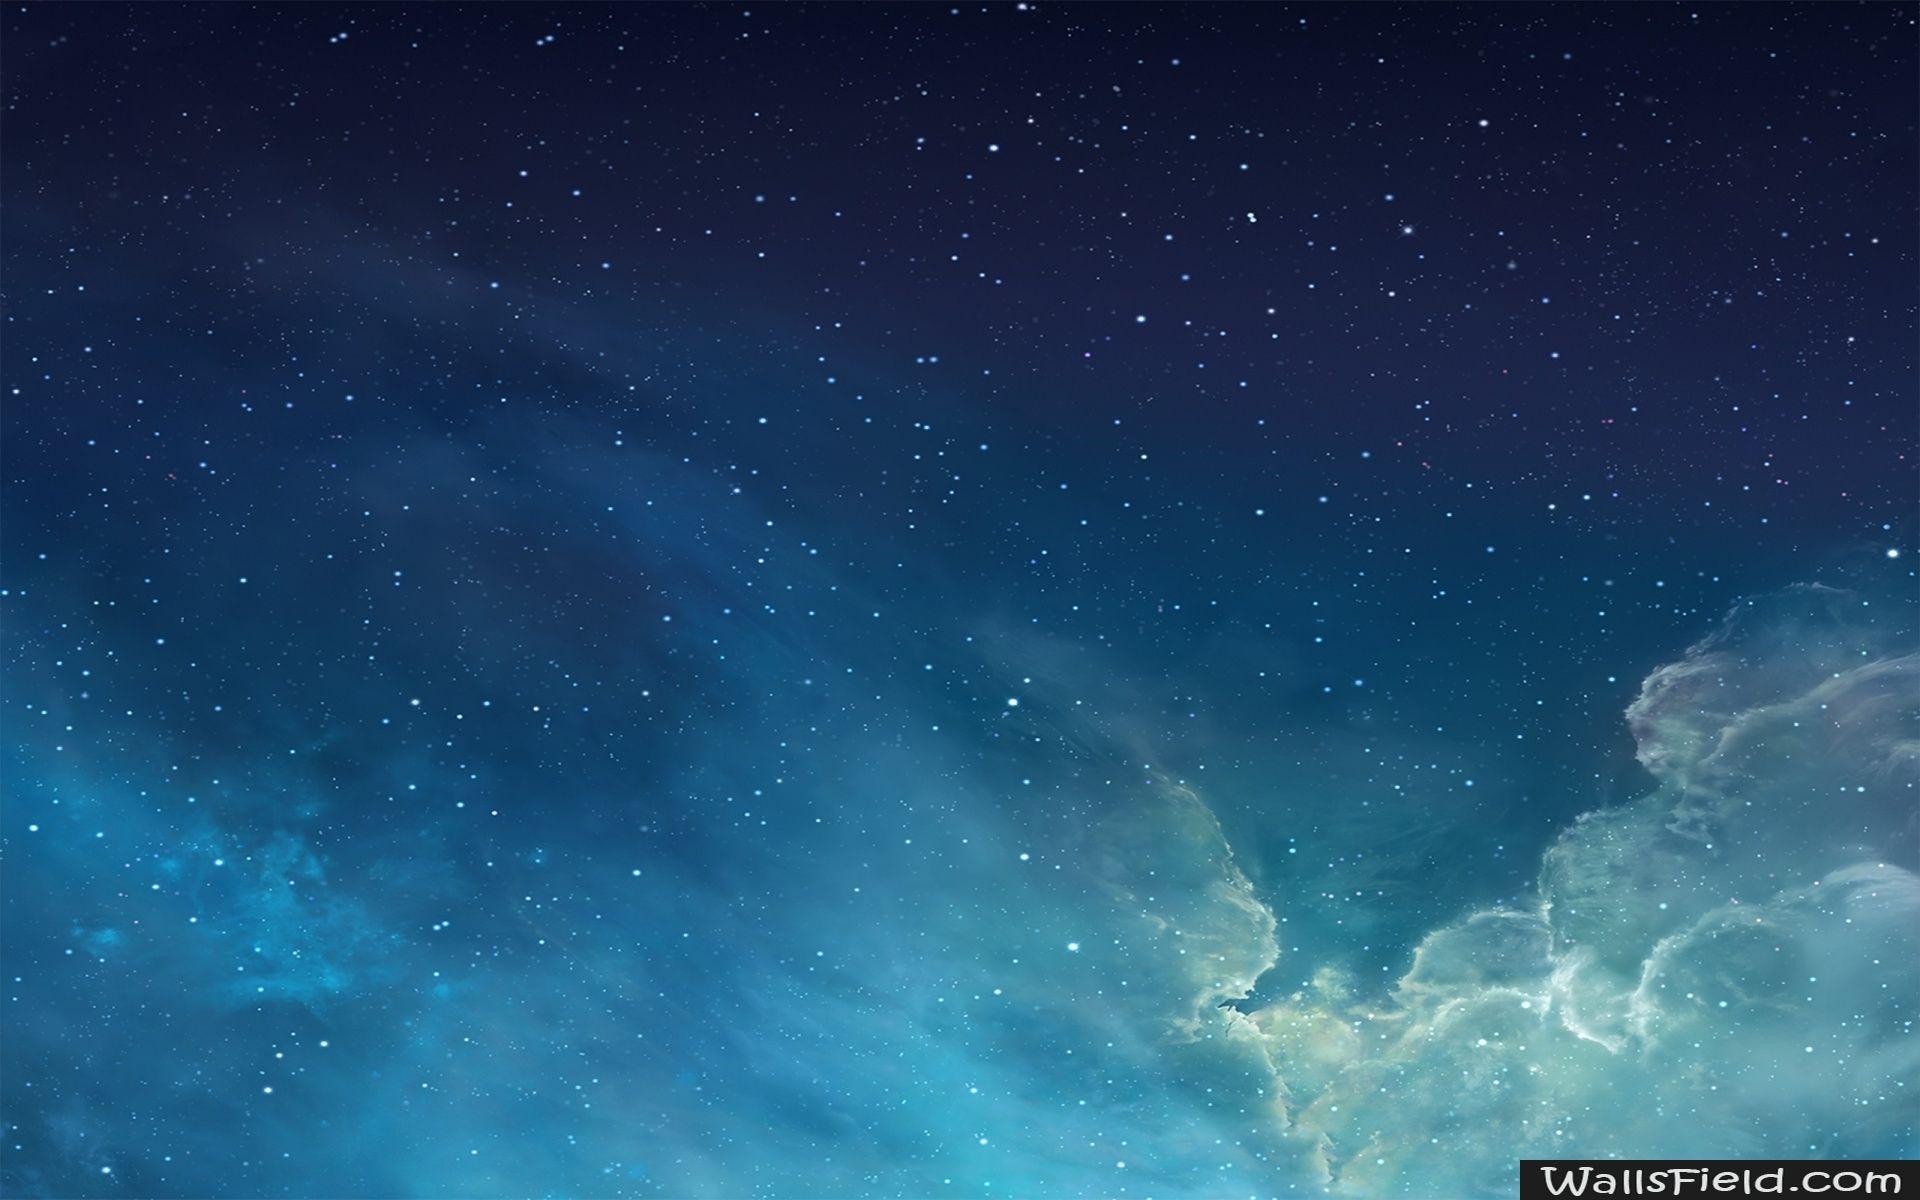 Ios 7 Galaxy Wallsfield Com Free Hd Wallpapers Hd Wallpaper Desktop Galaxy Wallpaper Blue Sky Wallpaper